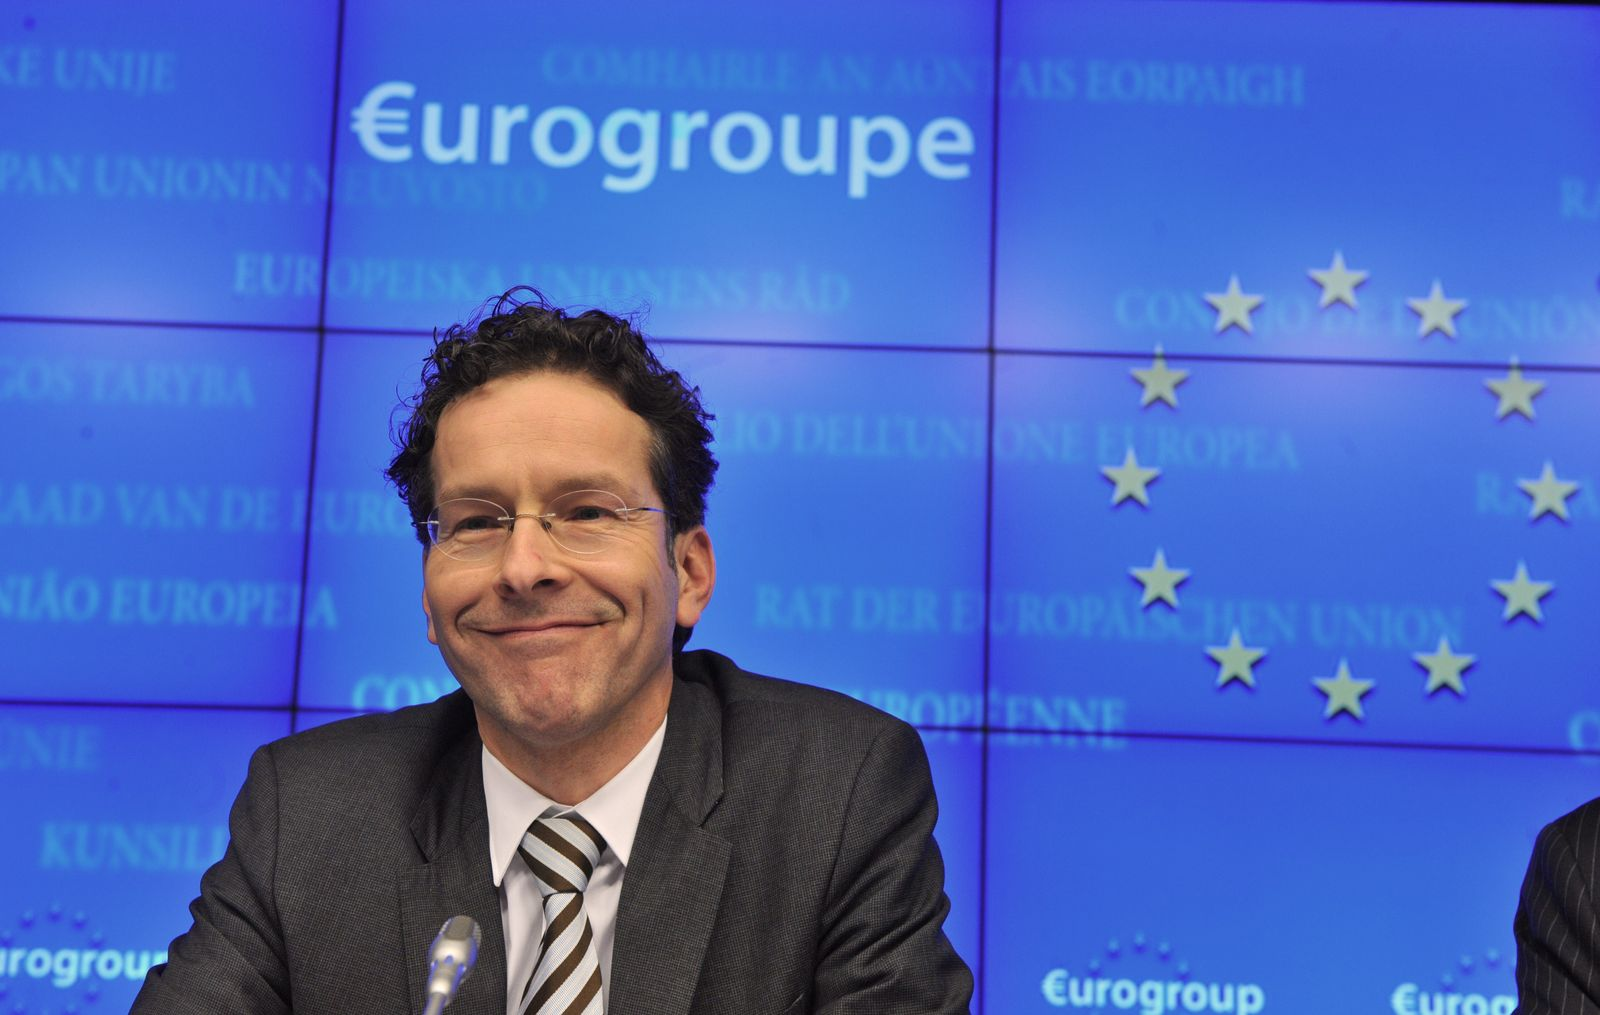 Euro Group Dijsselbloem